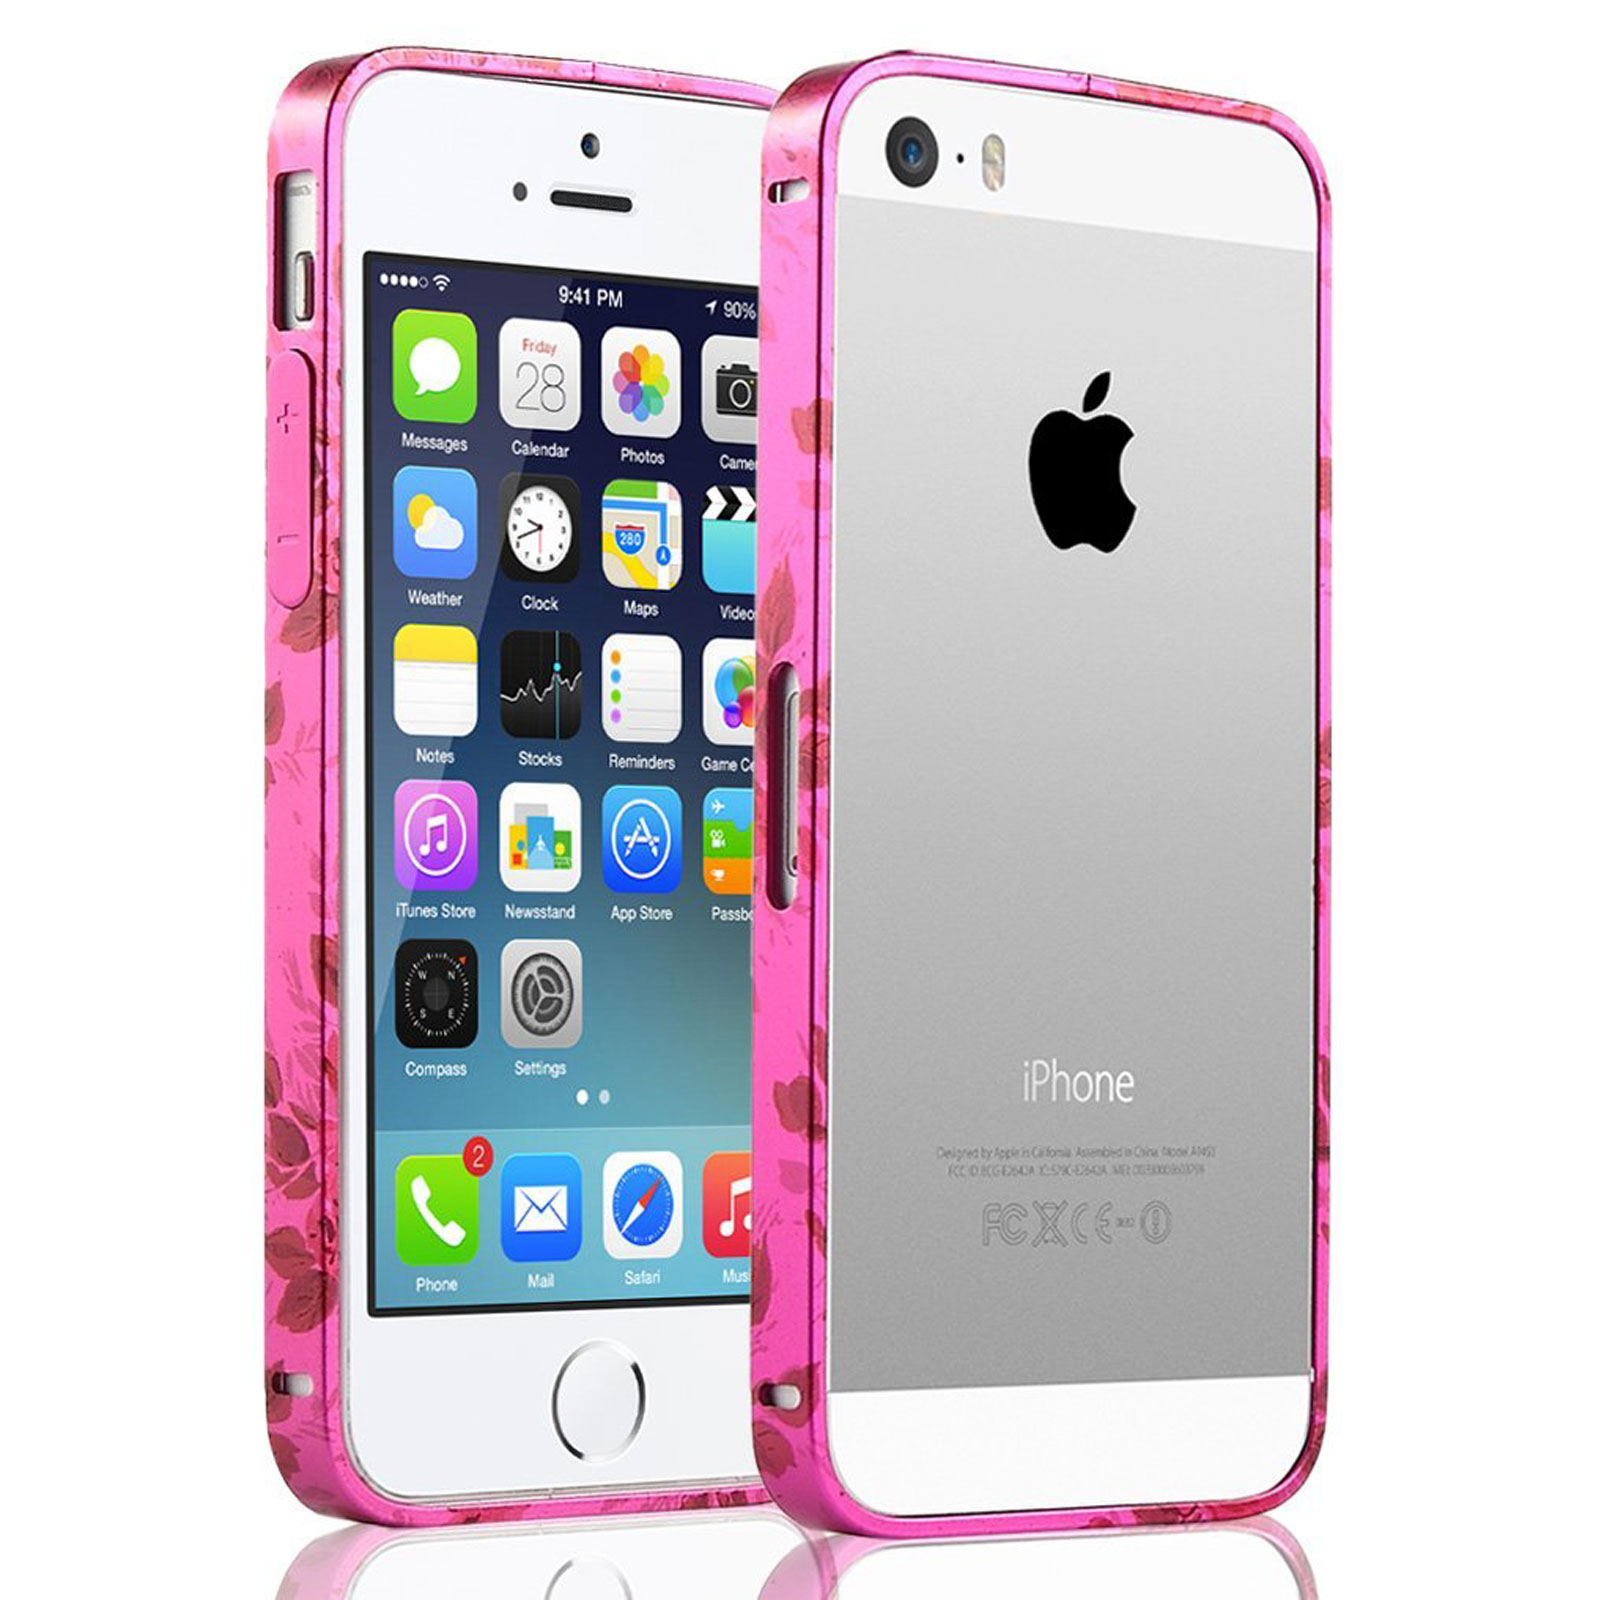 Ulak Iphone 5s Case Iphone 5 Case Bumper Case For Apple Iphone 5 5s